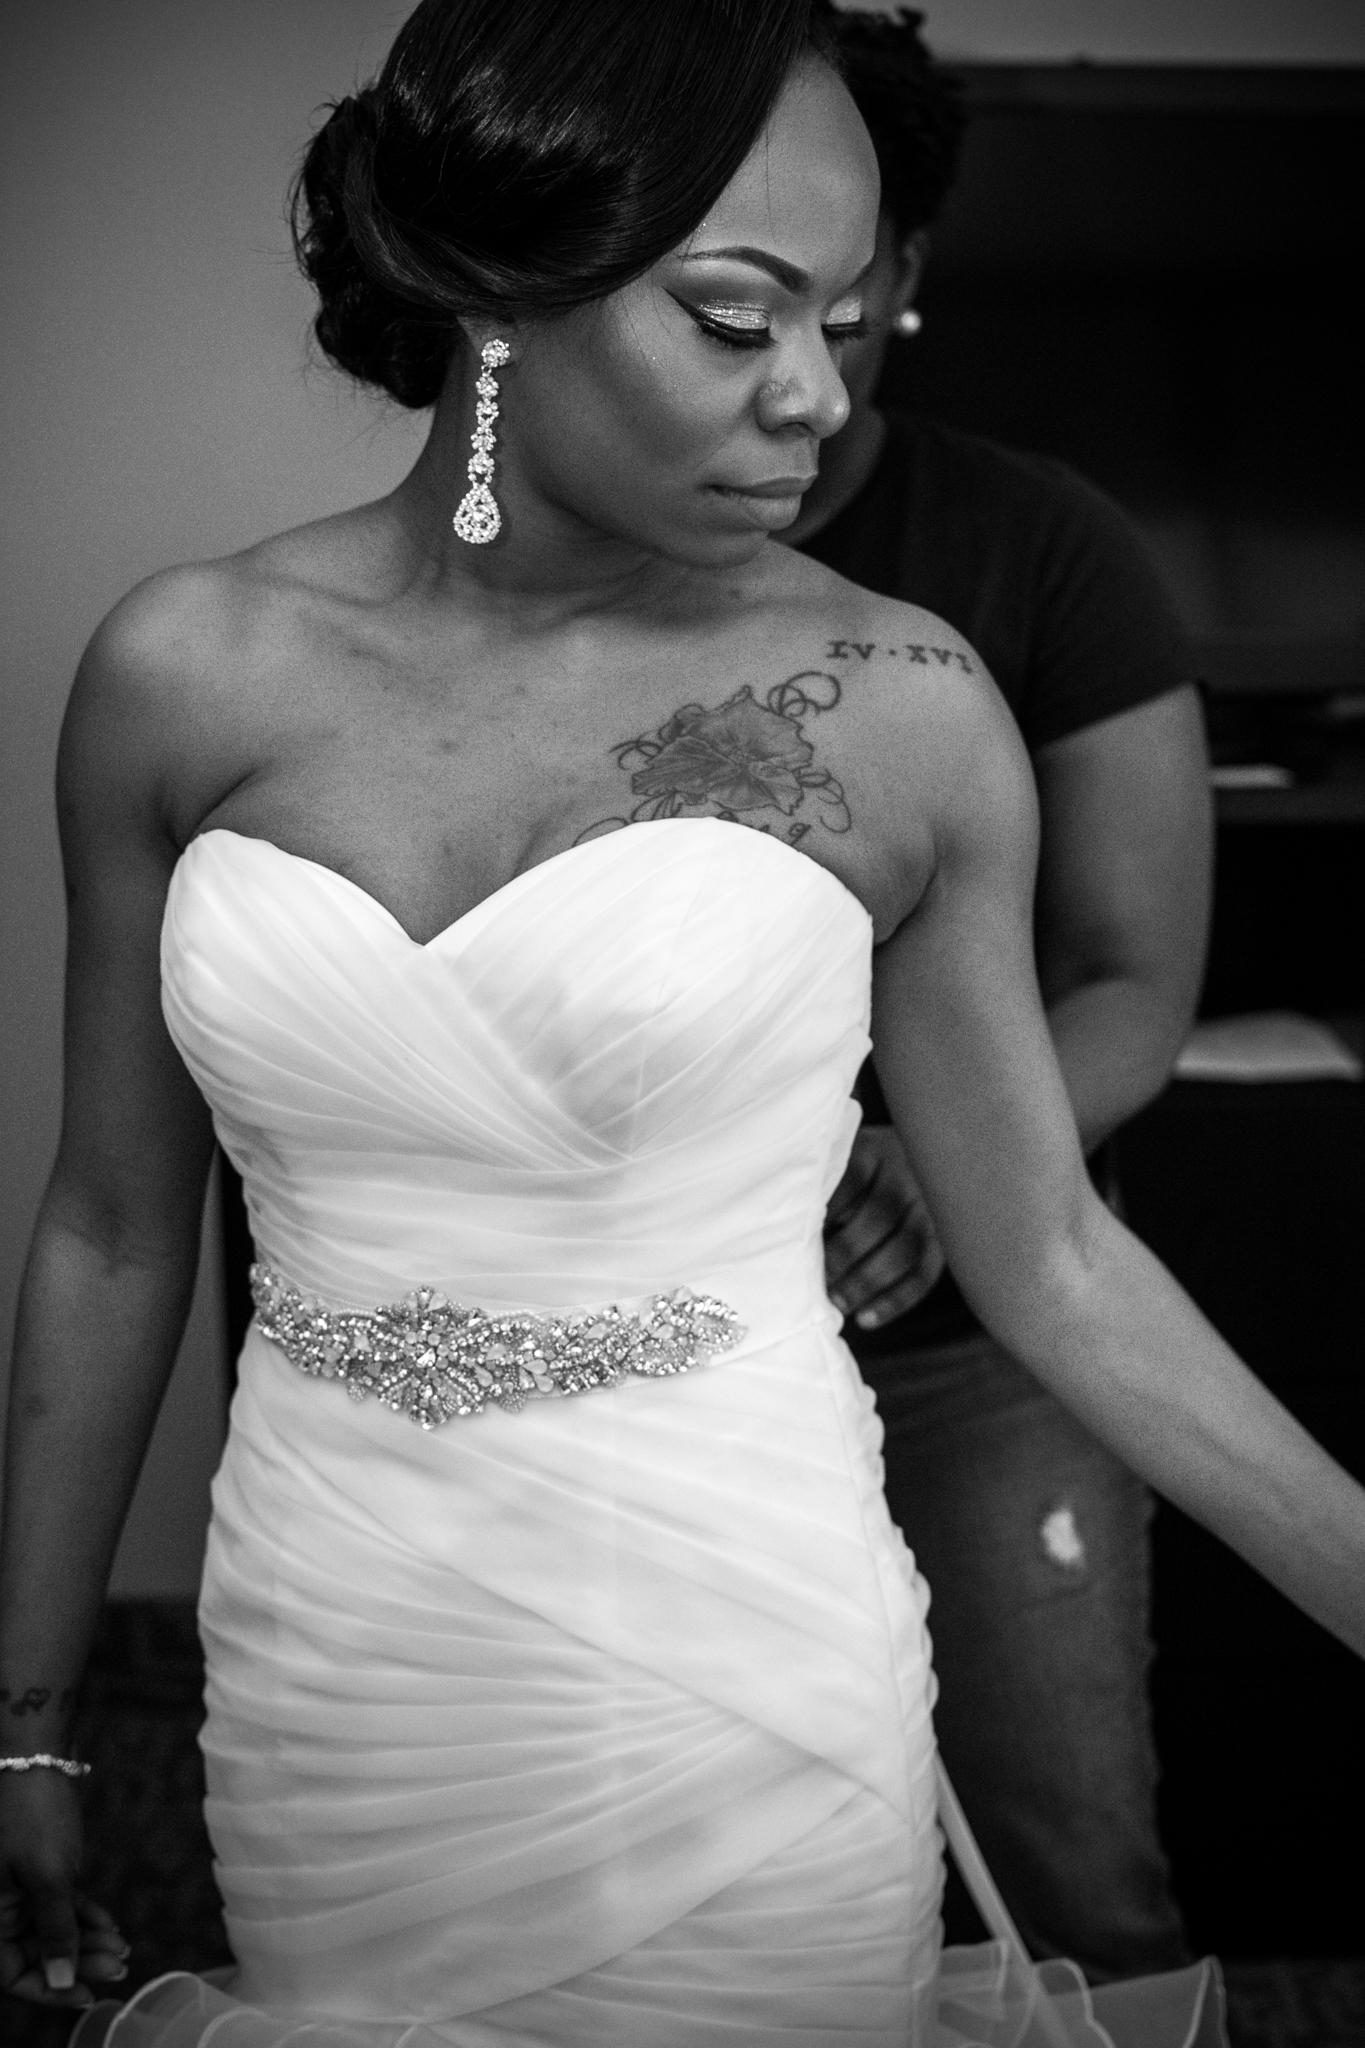 chaplin wedding (19 of 181).JPG